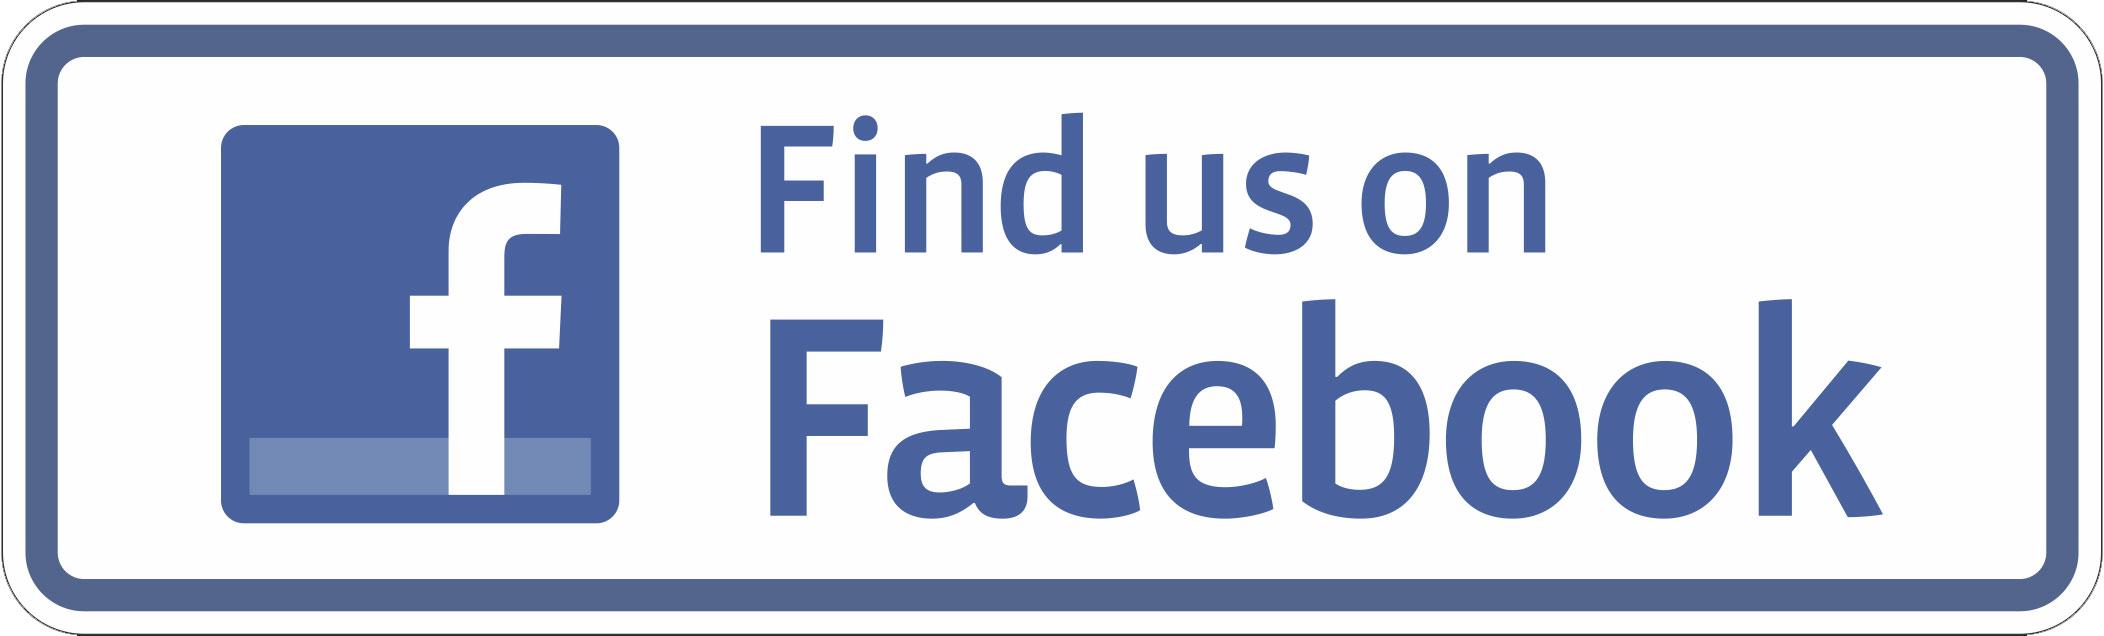 https://firebasestorage.googleapis.com/v0/b/phonesites-prod.appspot.com/o/images%2FBGXkGmzWlaQx7p0YWU9fp3jJA6s2%2F1580876373112*facebook*logo*jpg?alt=media&token=79c9c162-7dd2-476a-a01c-97f095aede82